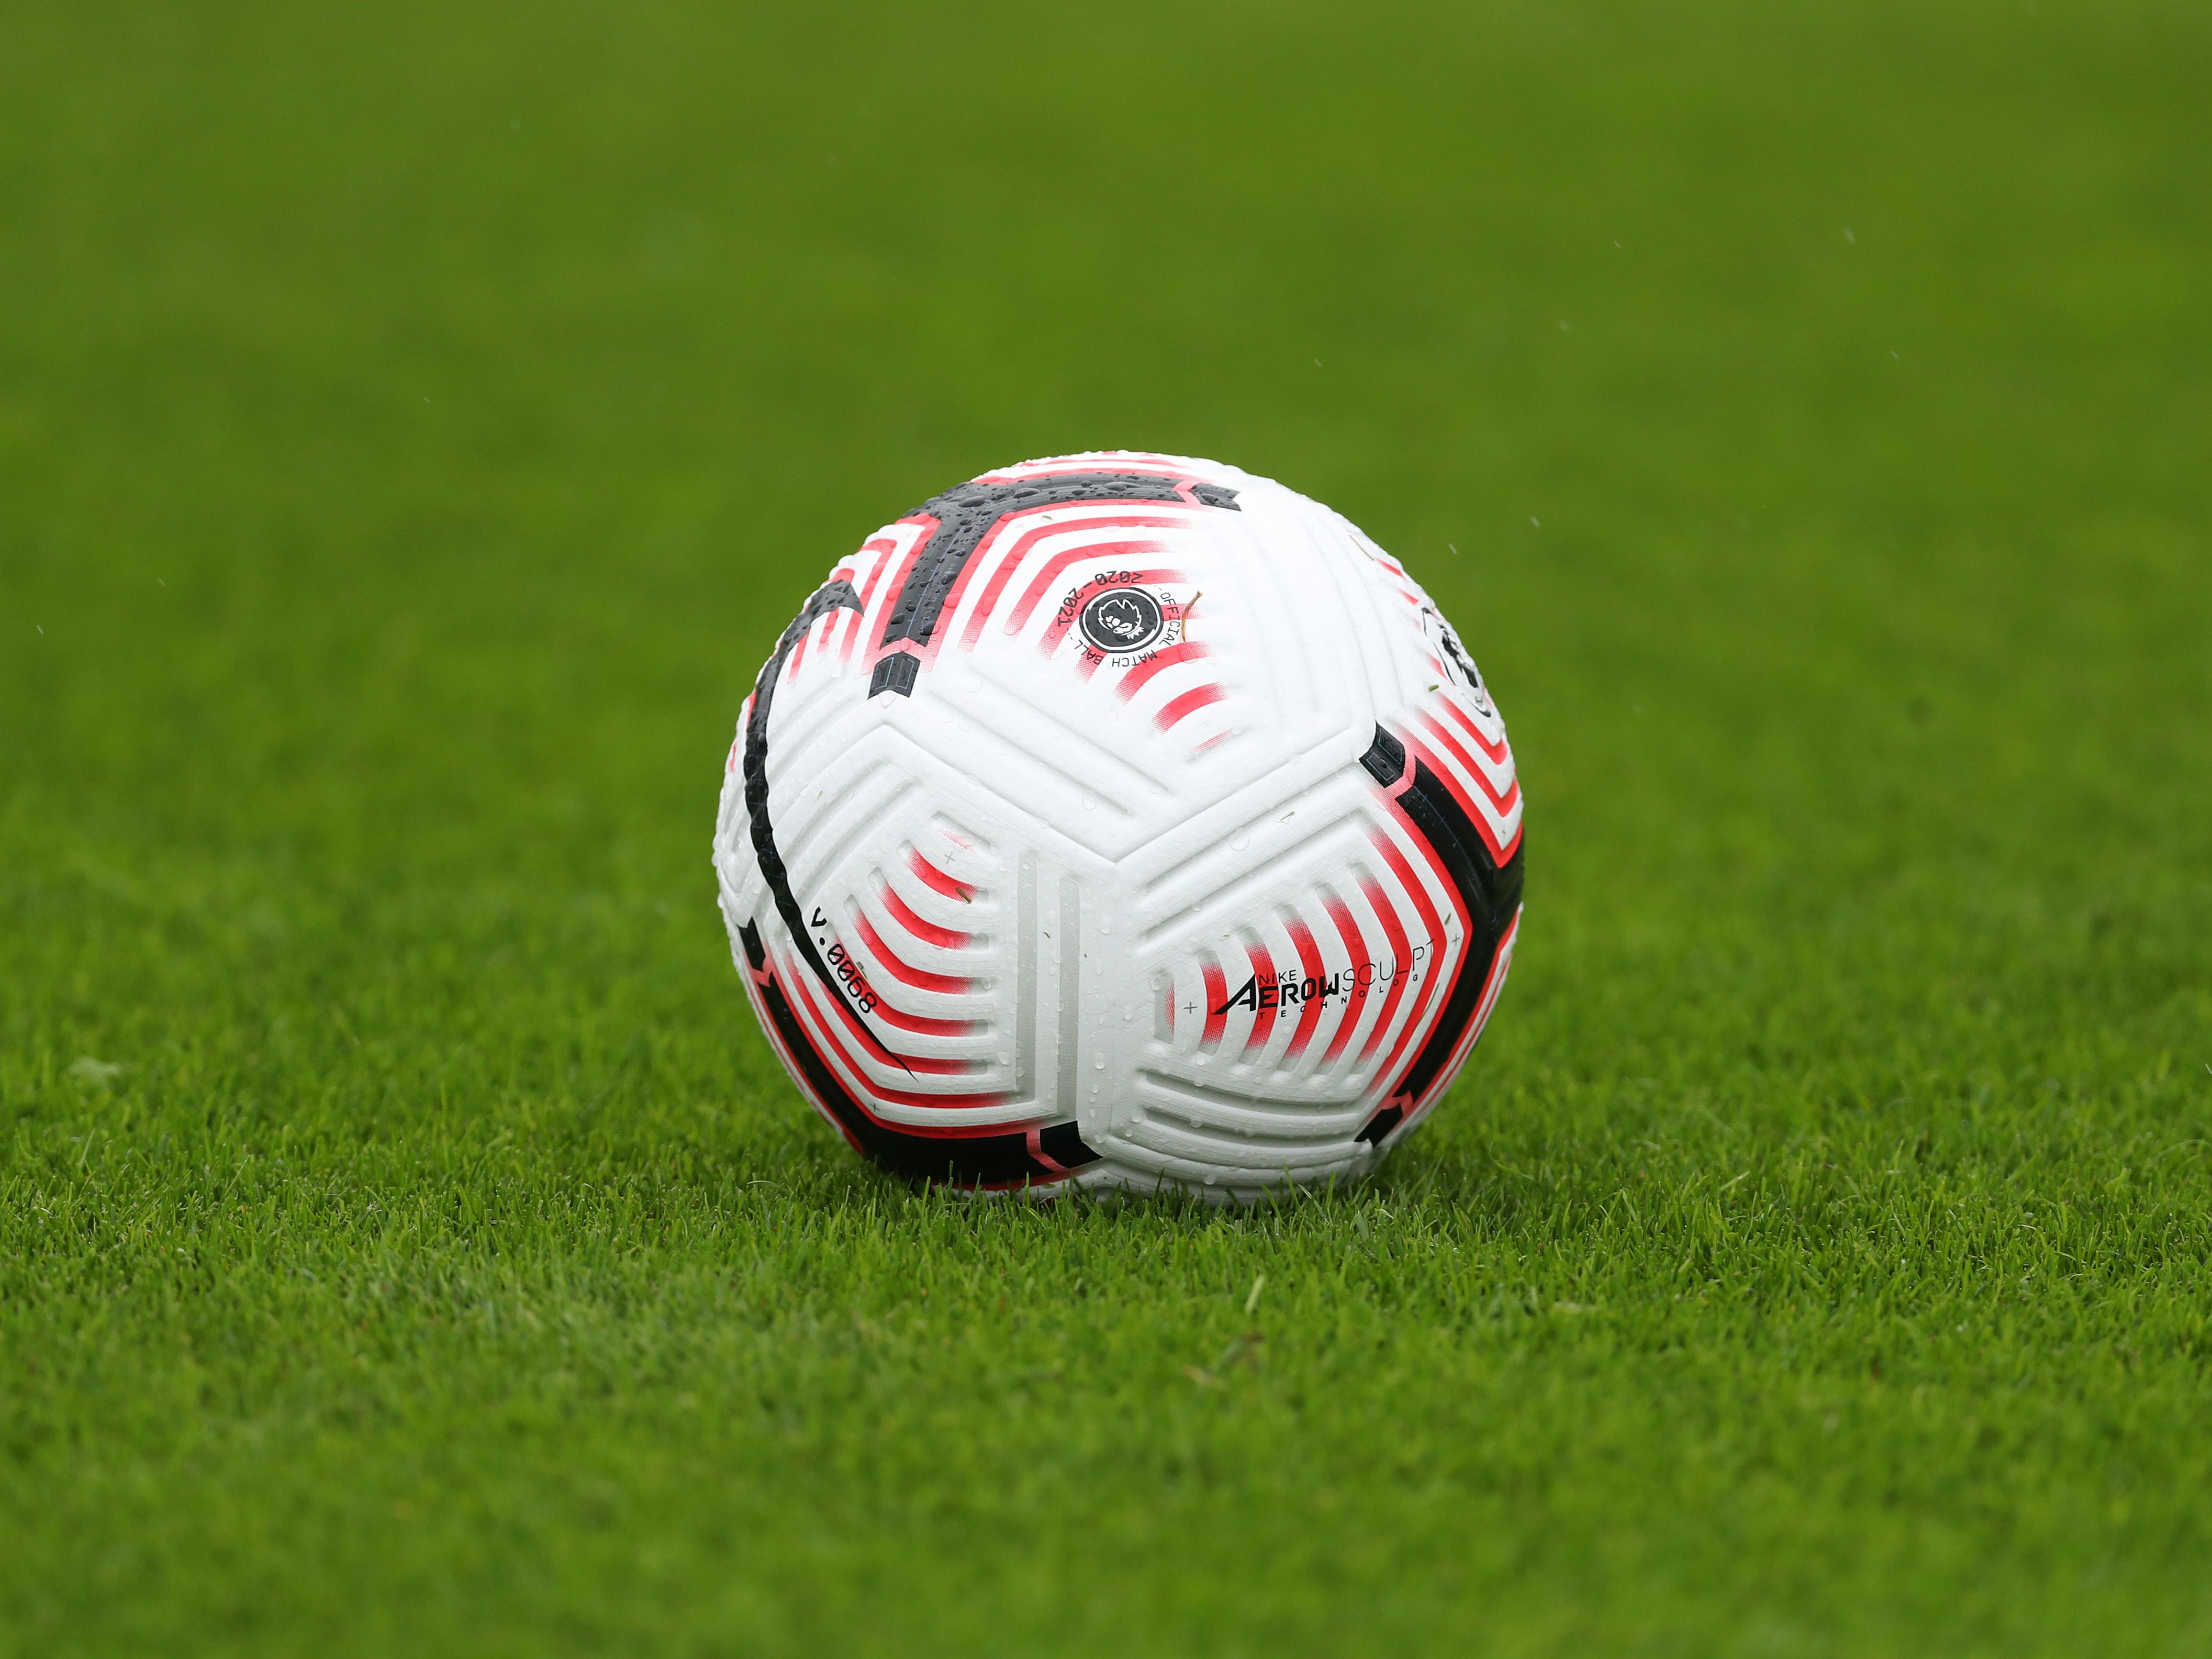 Premier League ball